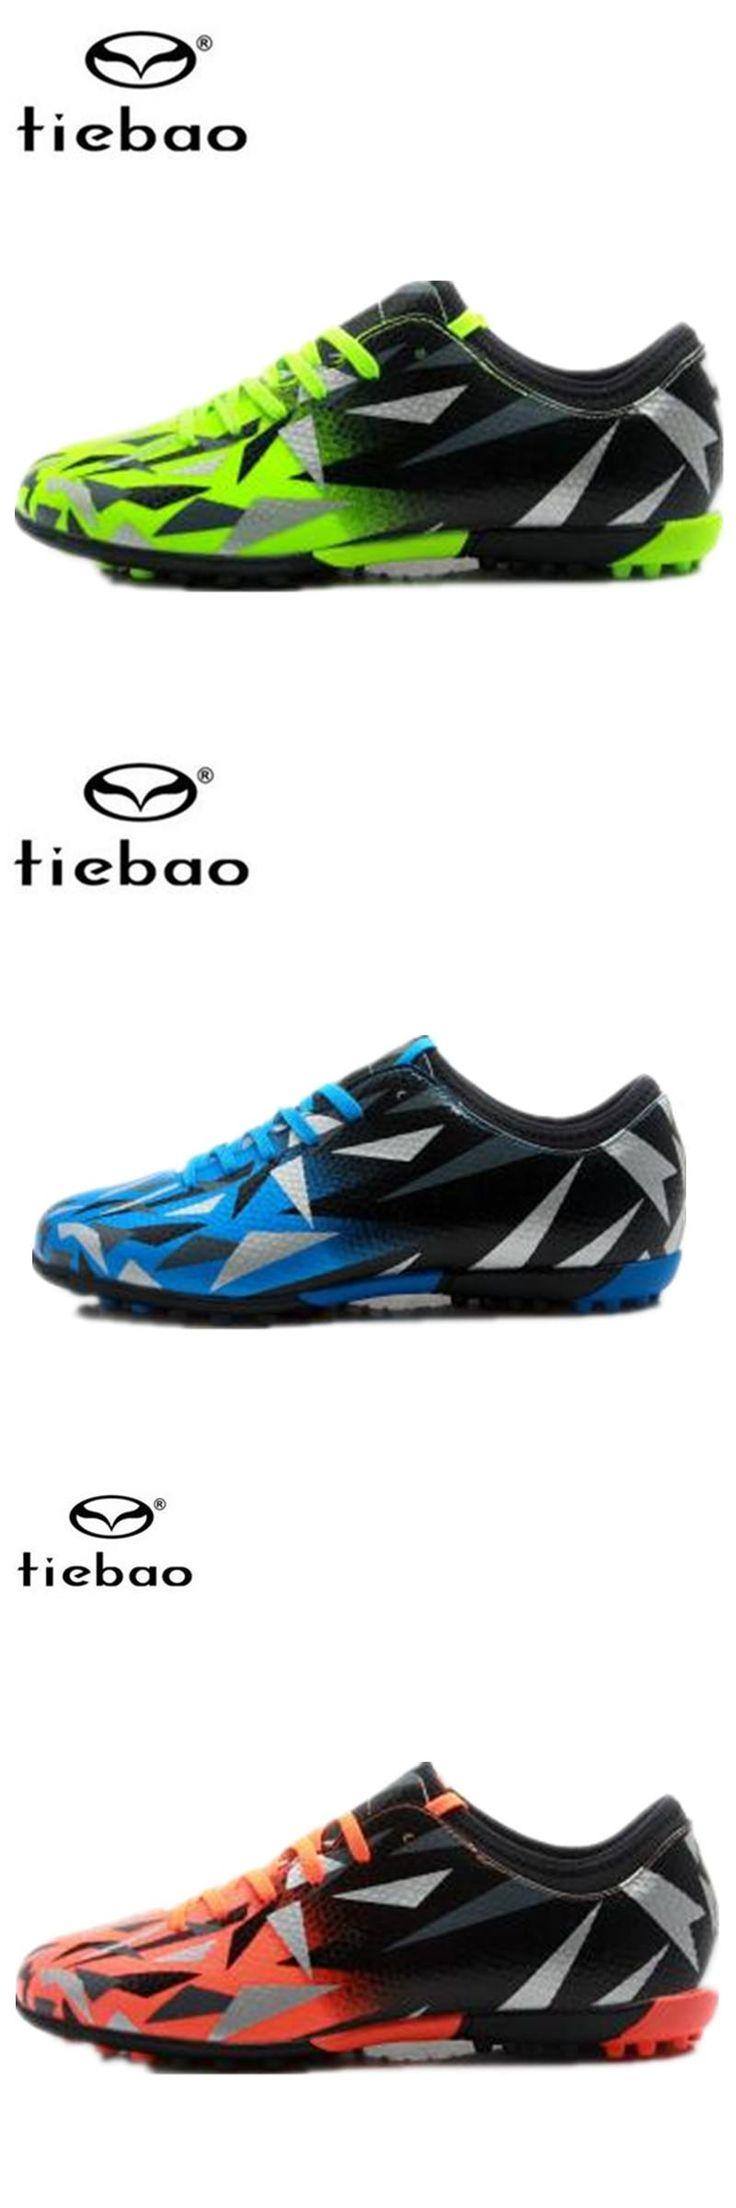 [Visit to Buy] TIEBAO football boots zapatillas futbol sala hombres botines de futbol soccer cleats superfly fussball schuhe scarpe calcetto #Advertisement